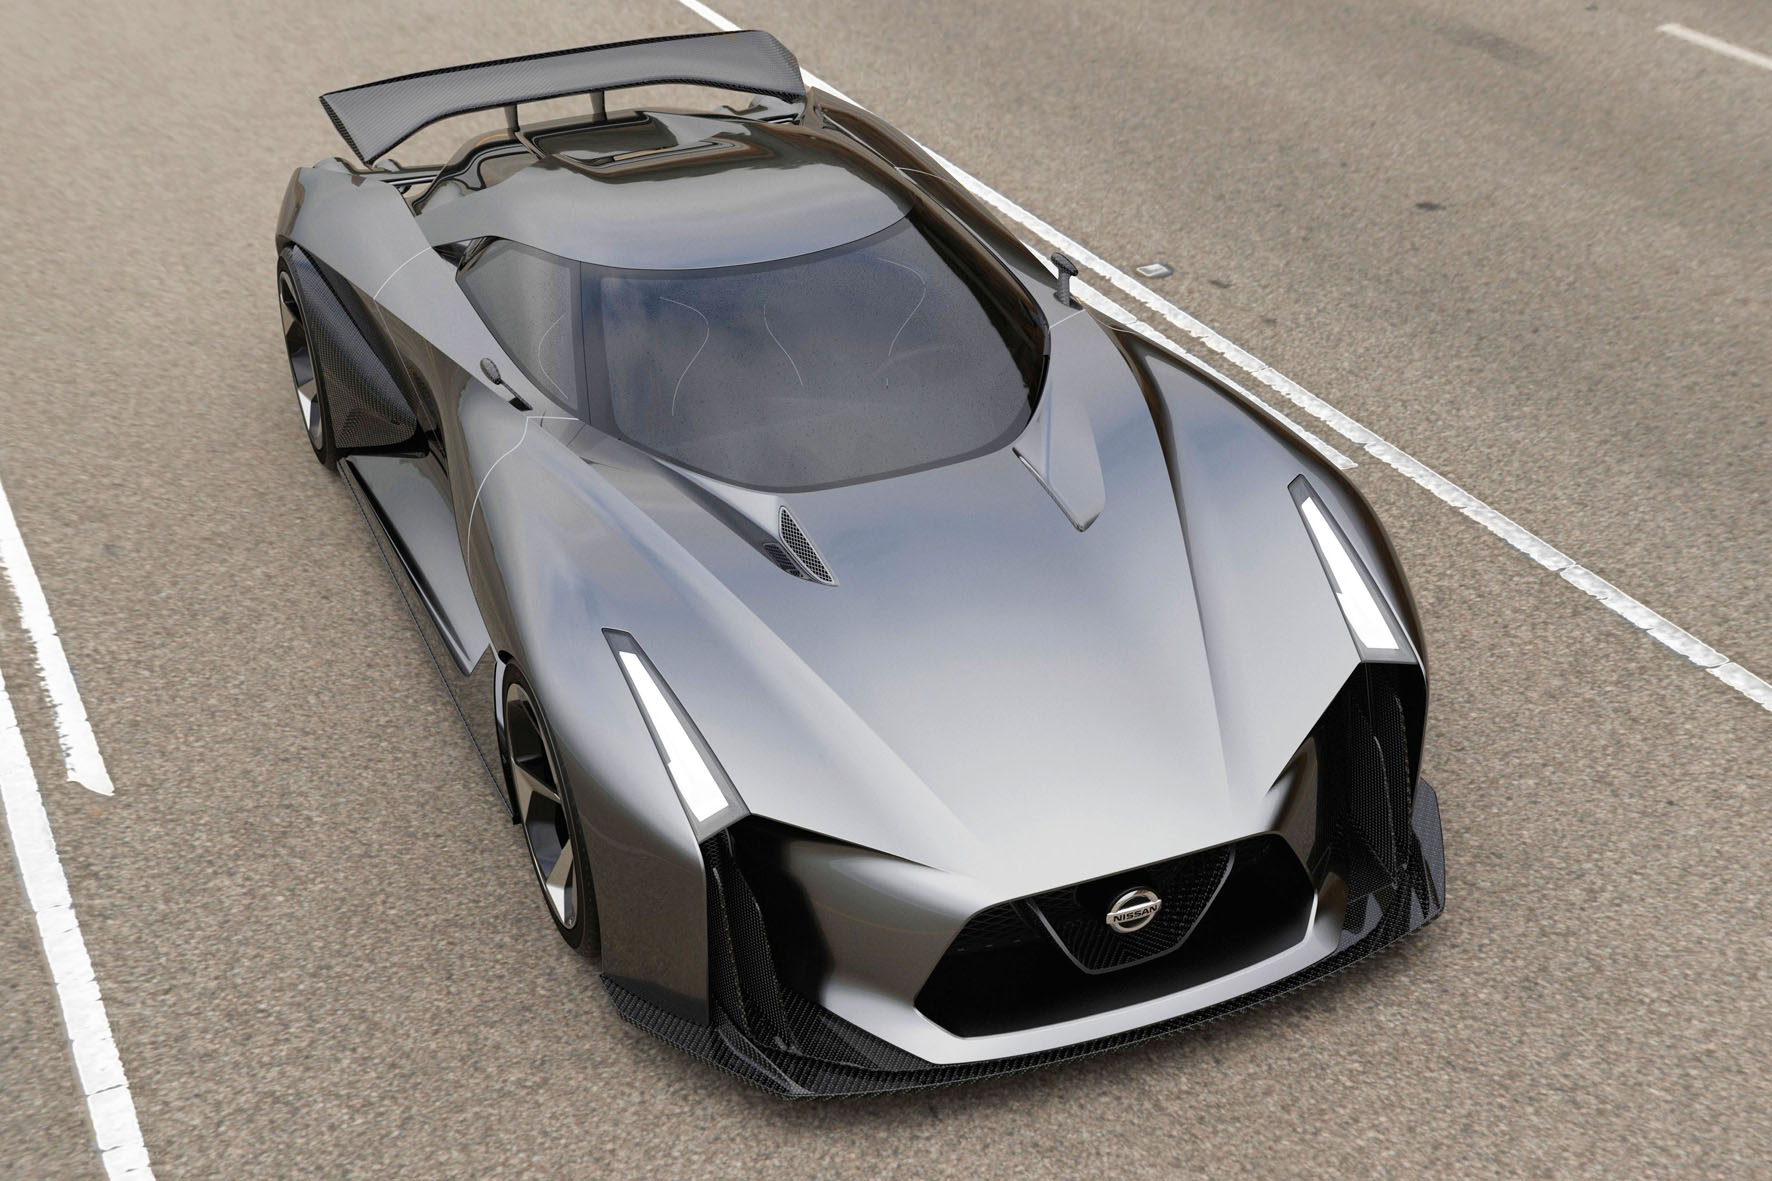 Nissan Concept 2020 Vision Gran Turismo für das Spiel Gran Turismo